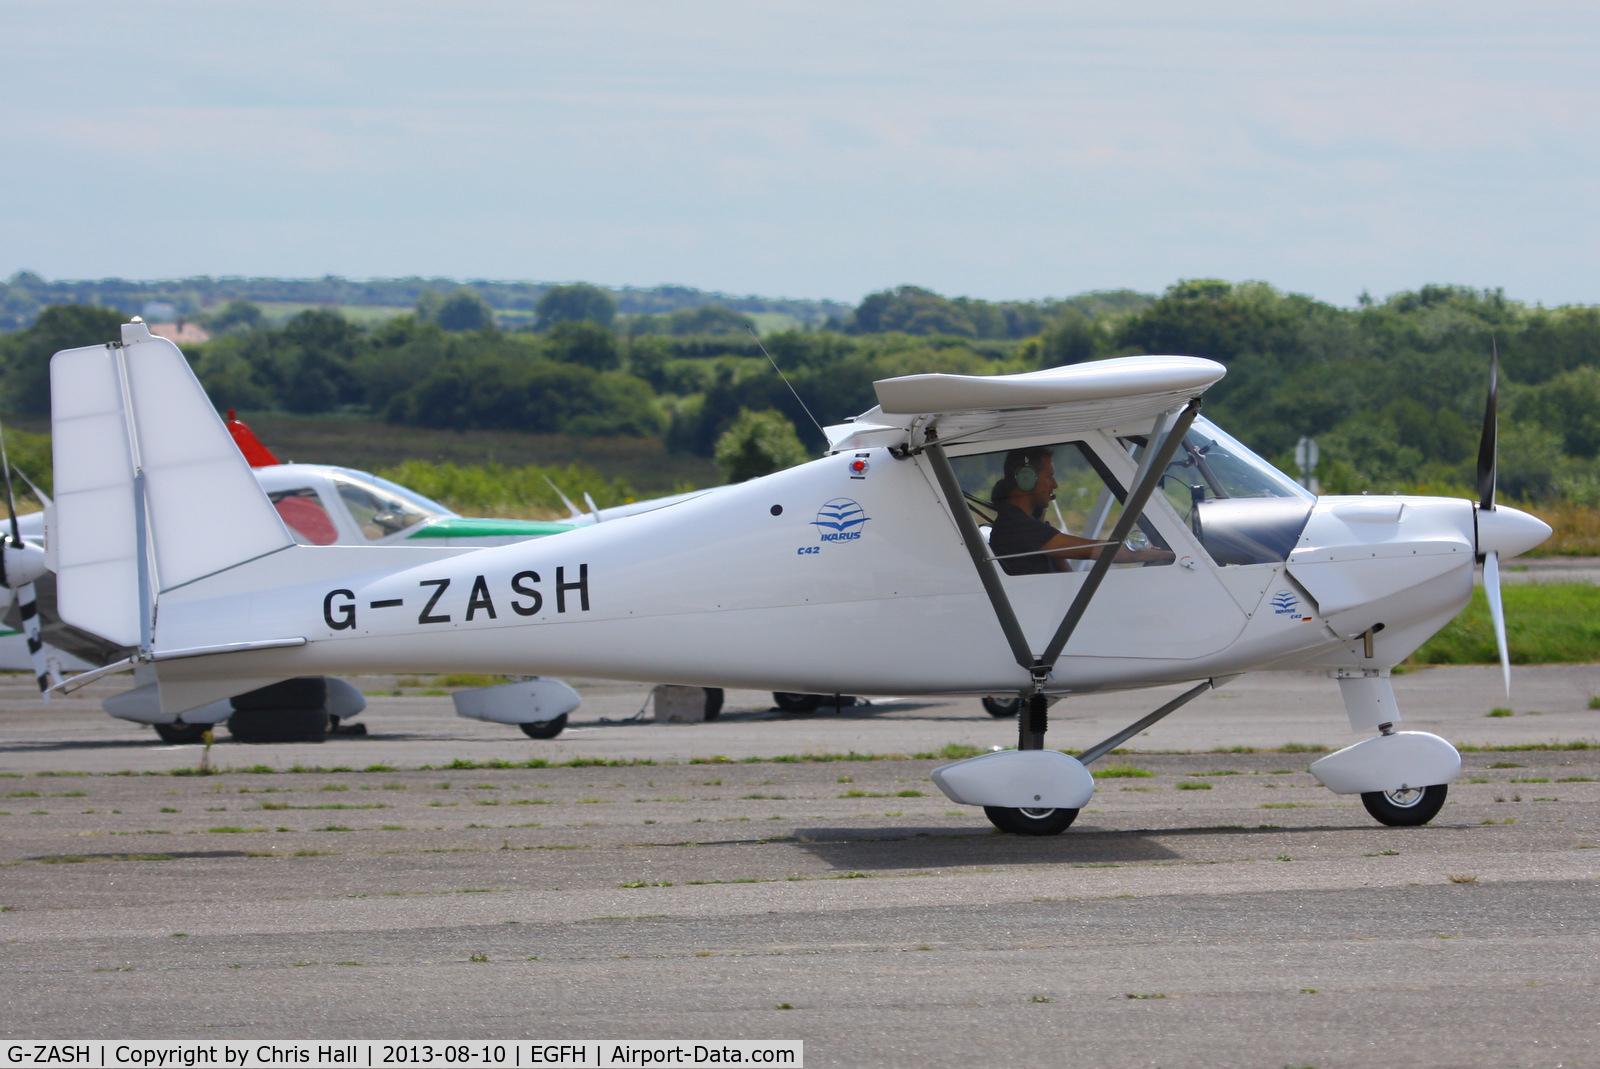 G-ZASH, 2013 Comco Ikarus C42 FB80 C/N 1304-7257, privately owned